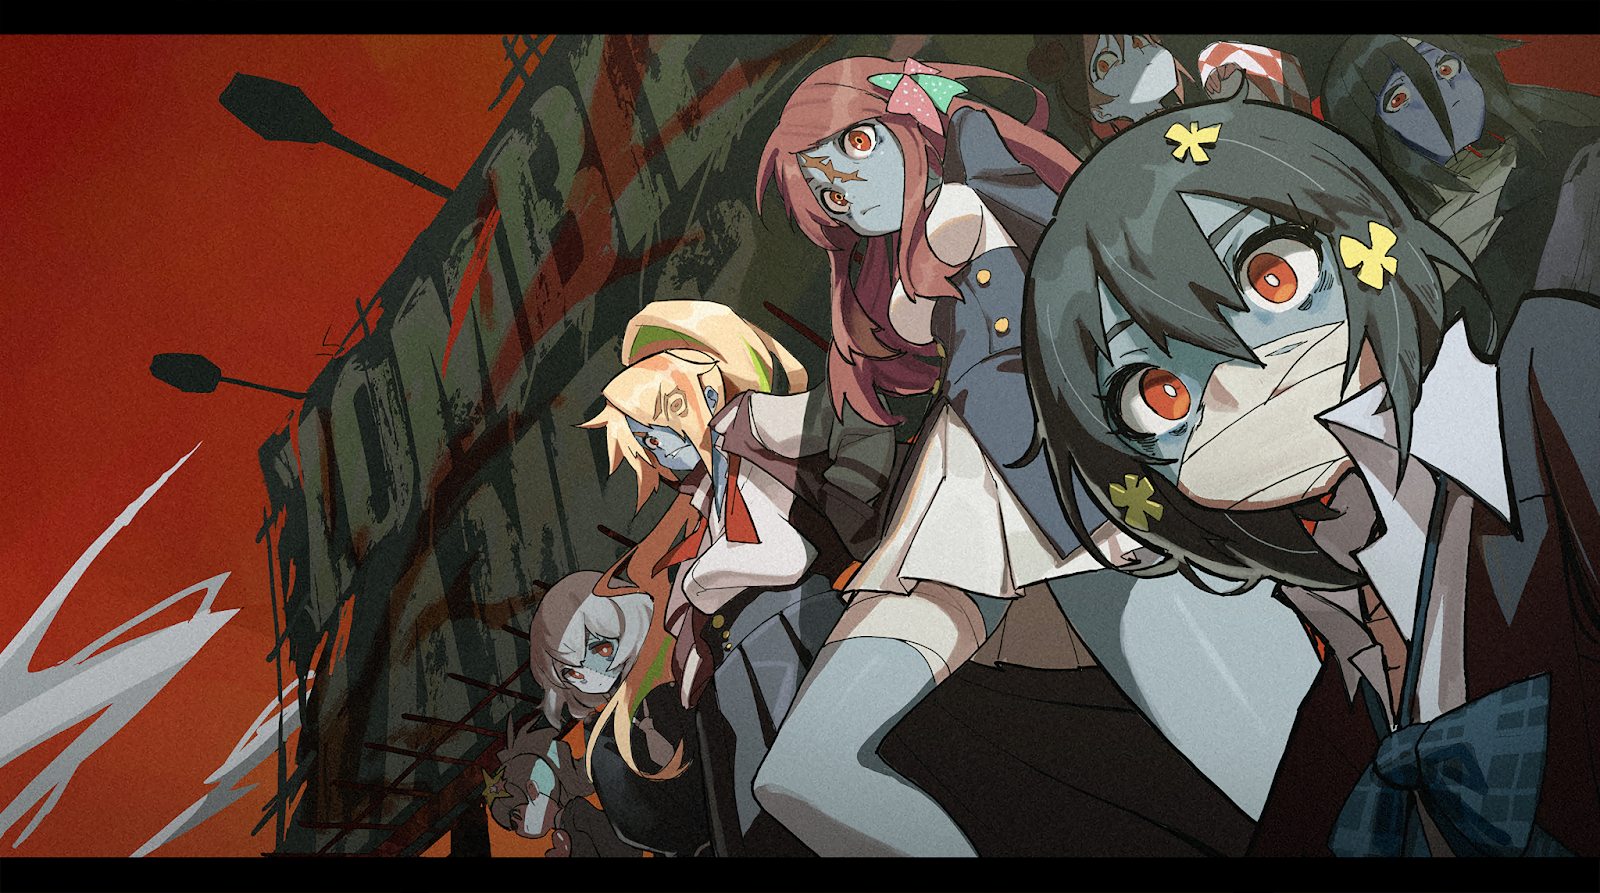 Zombie Land Saga Wallpapers Hd